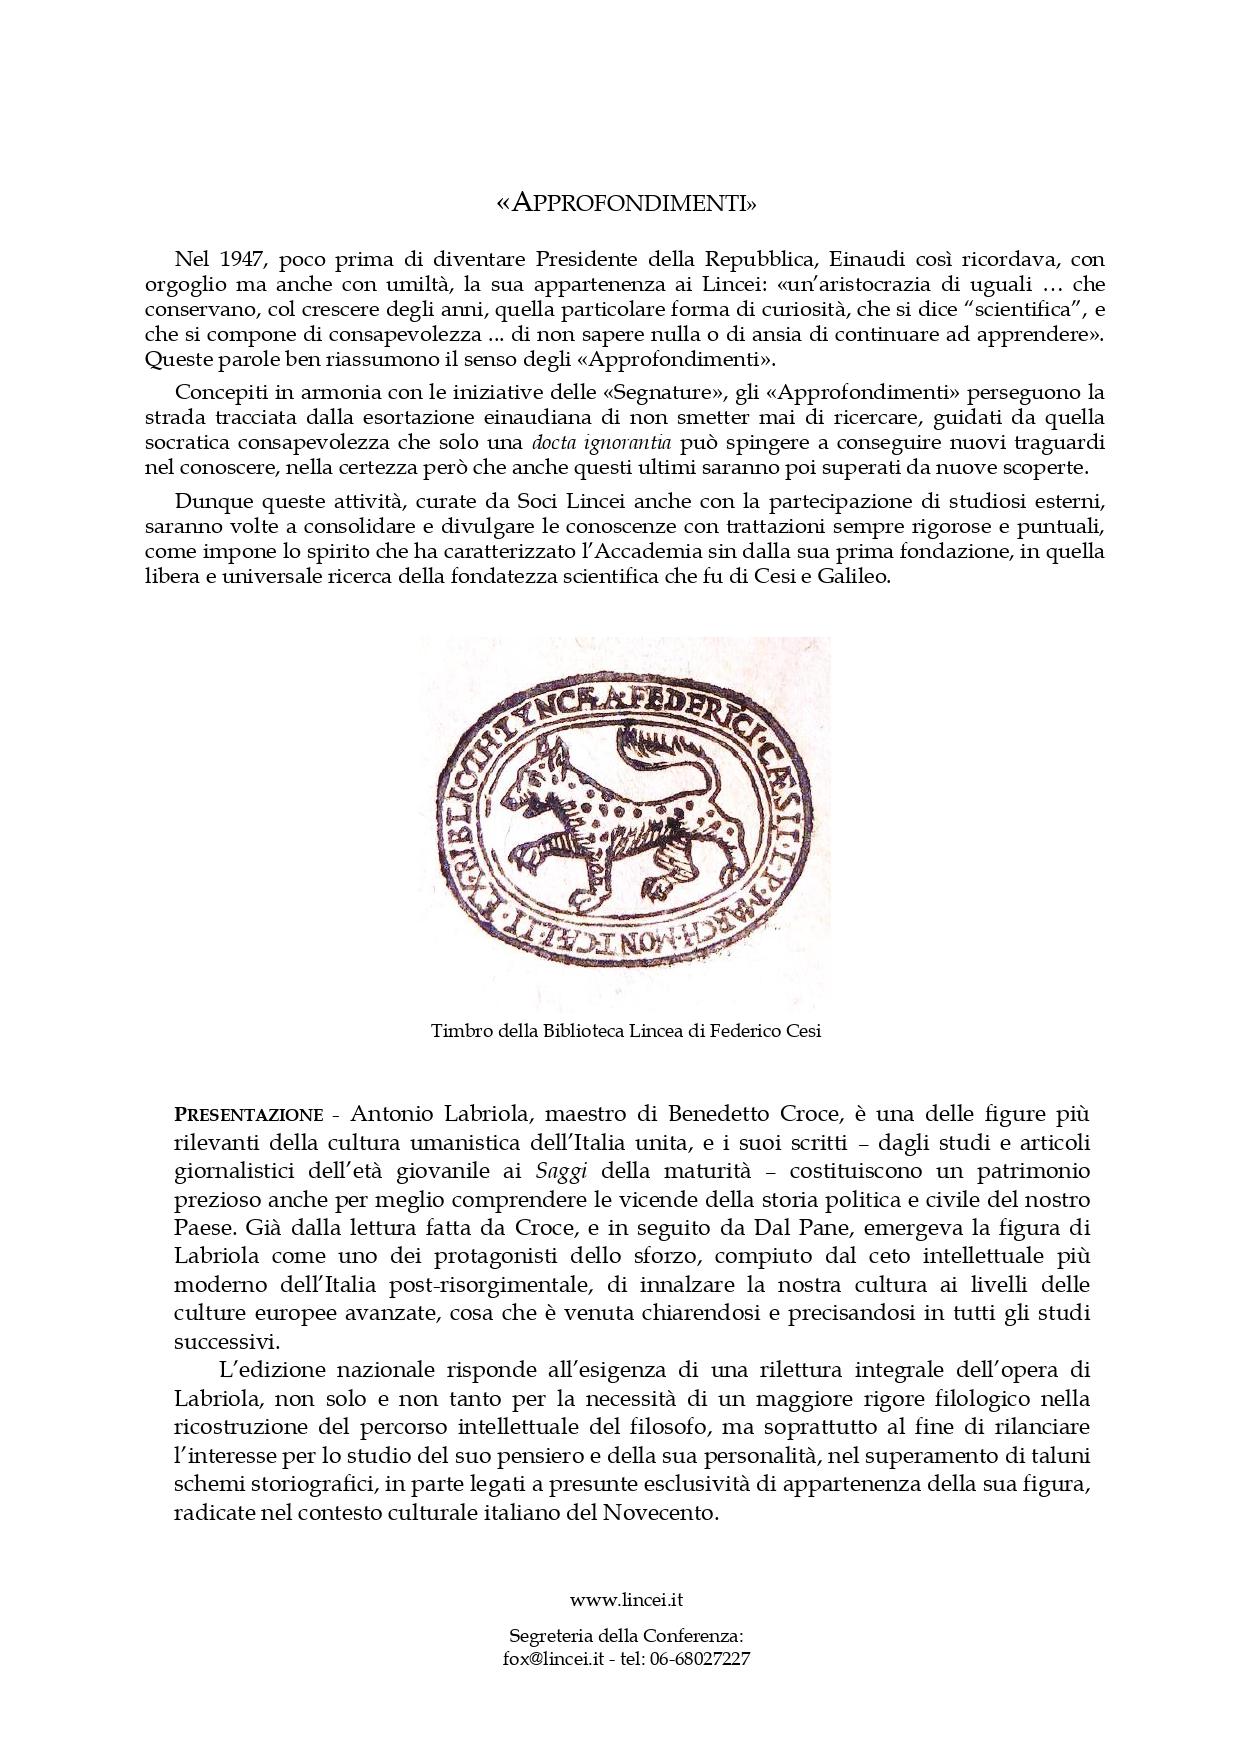 locandina-labriola_page-0002